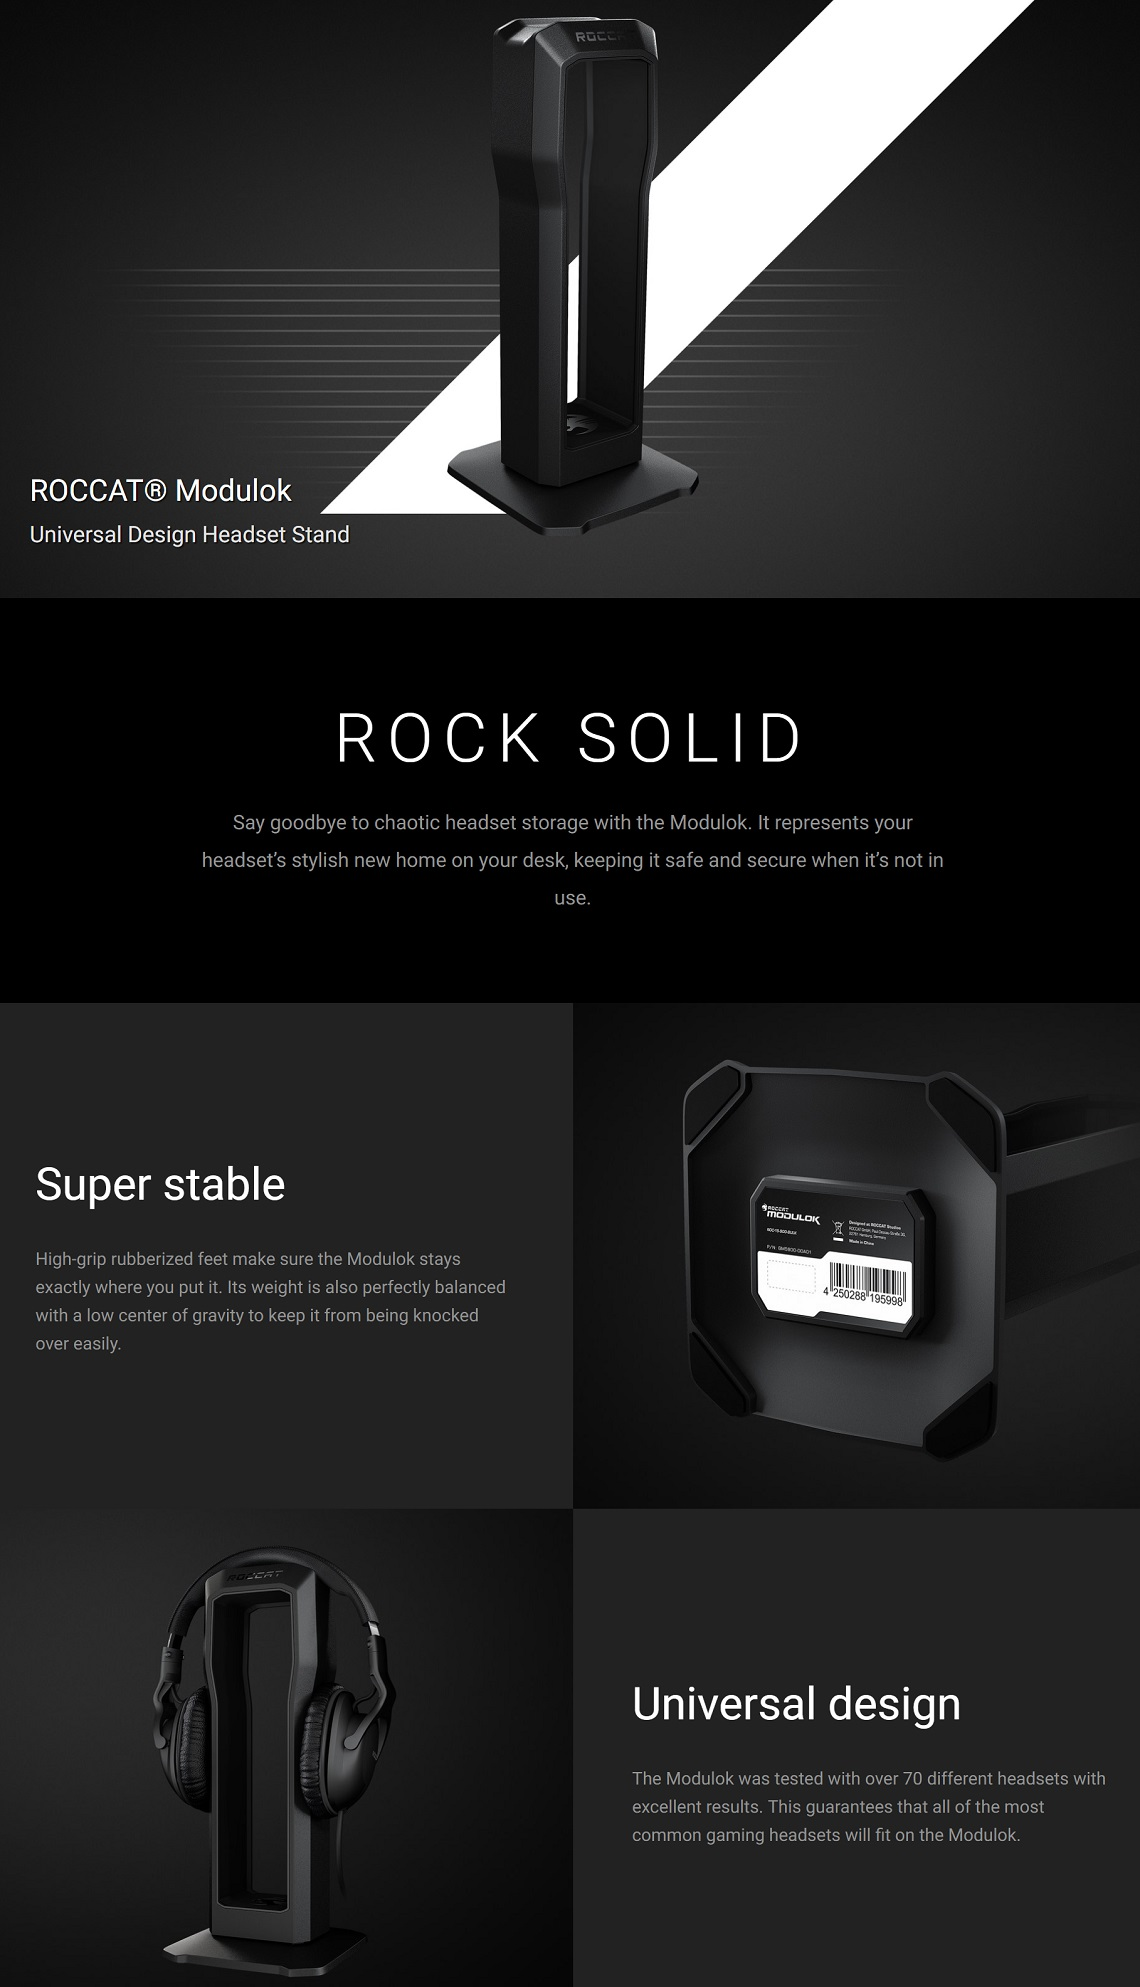 Roccat Modulok Modular Headset Stand Super Stable Universal Design Headset Stand